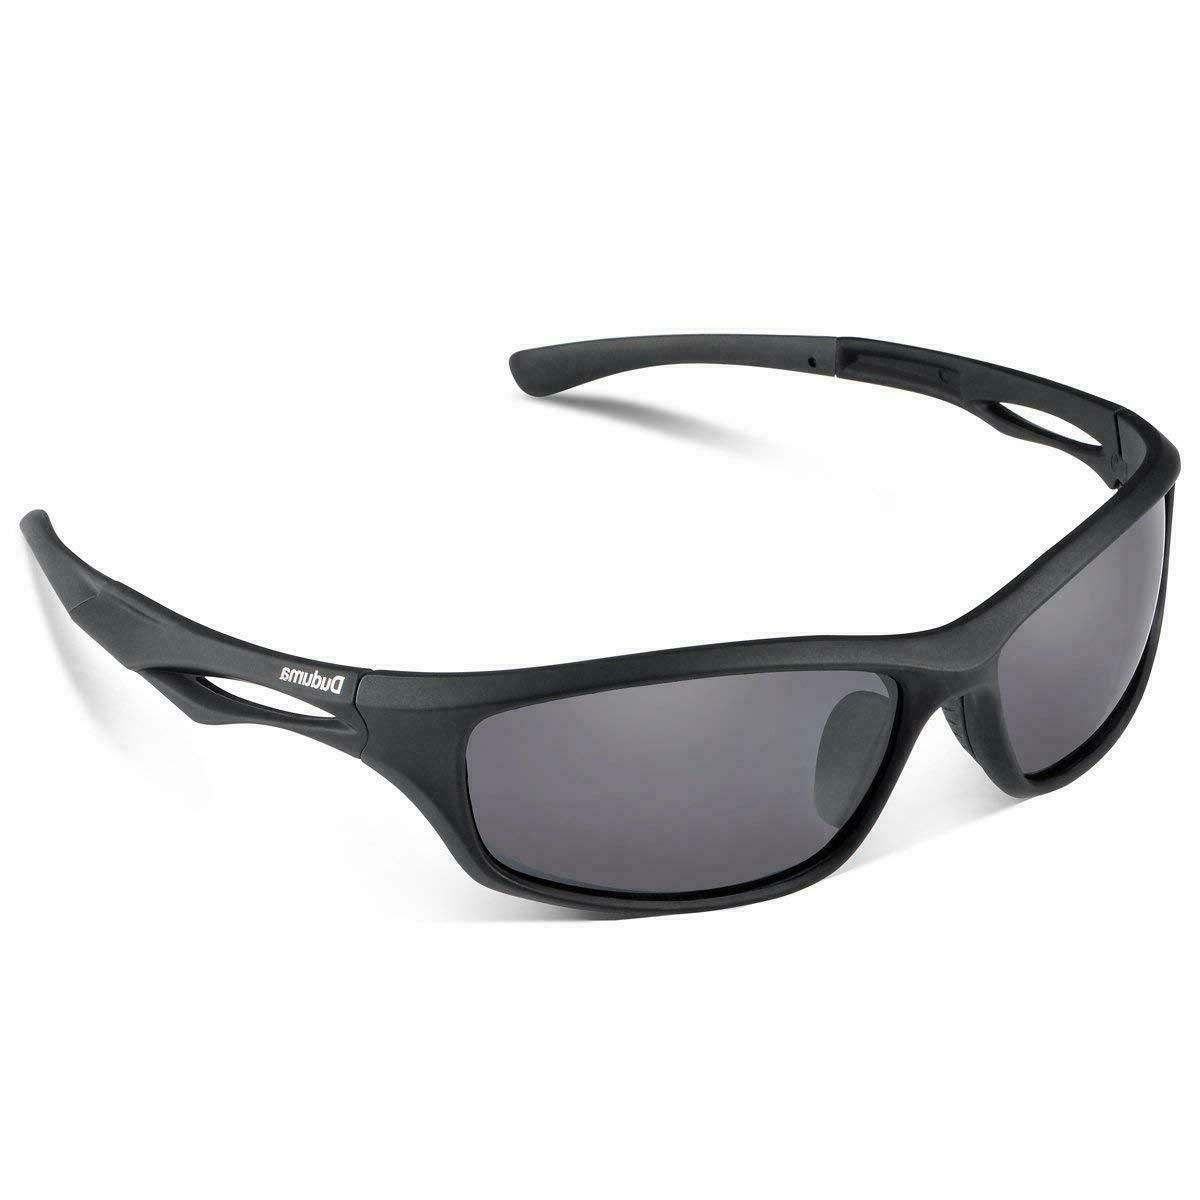 duduma polarized sports sunglasses for baseball cycling